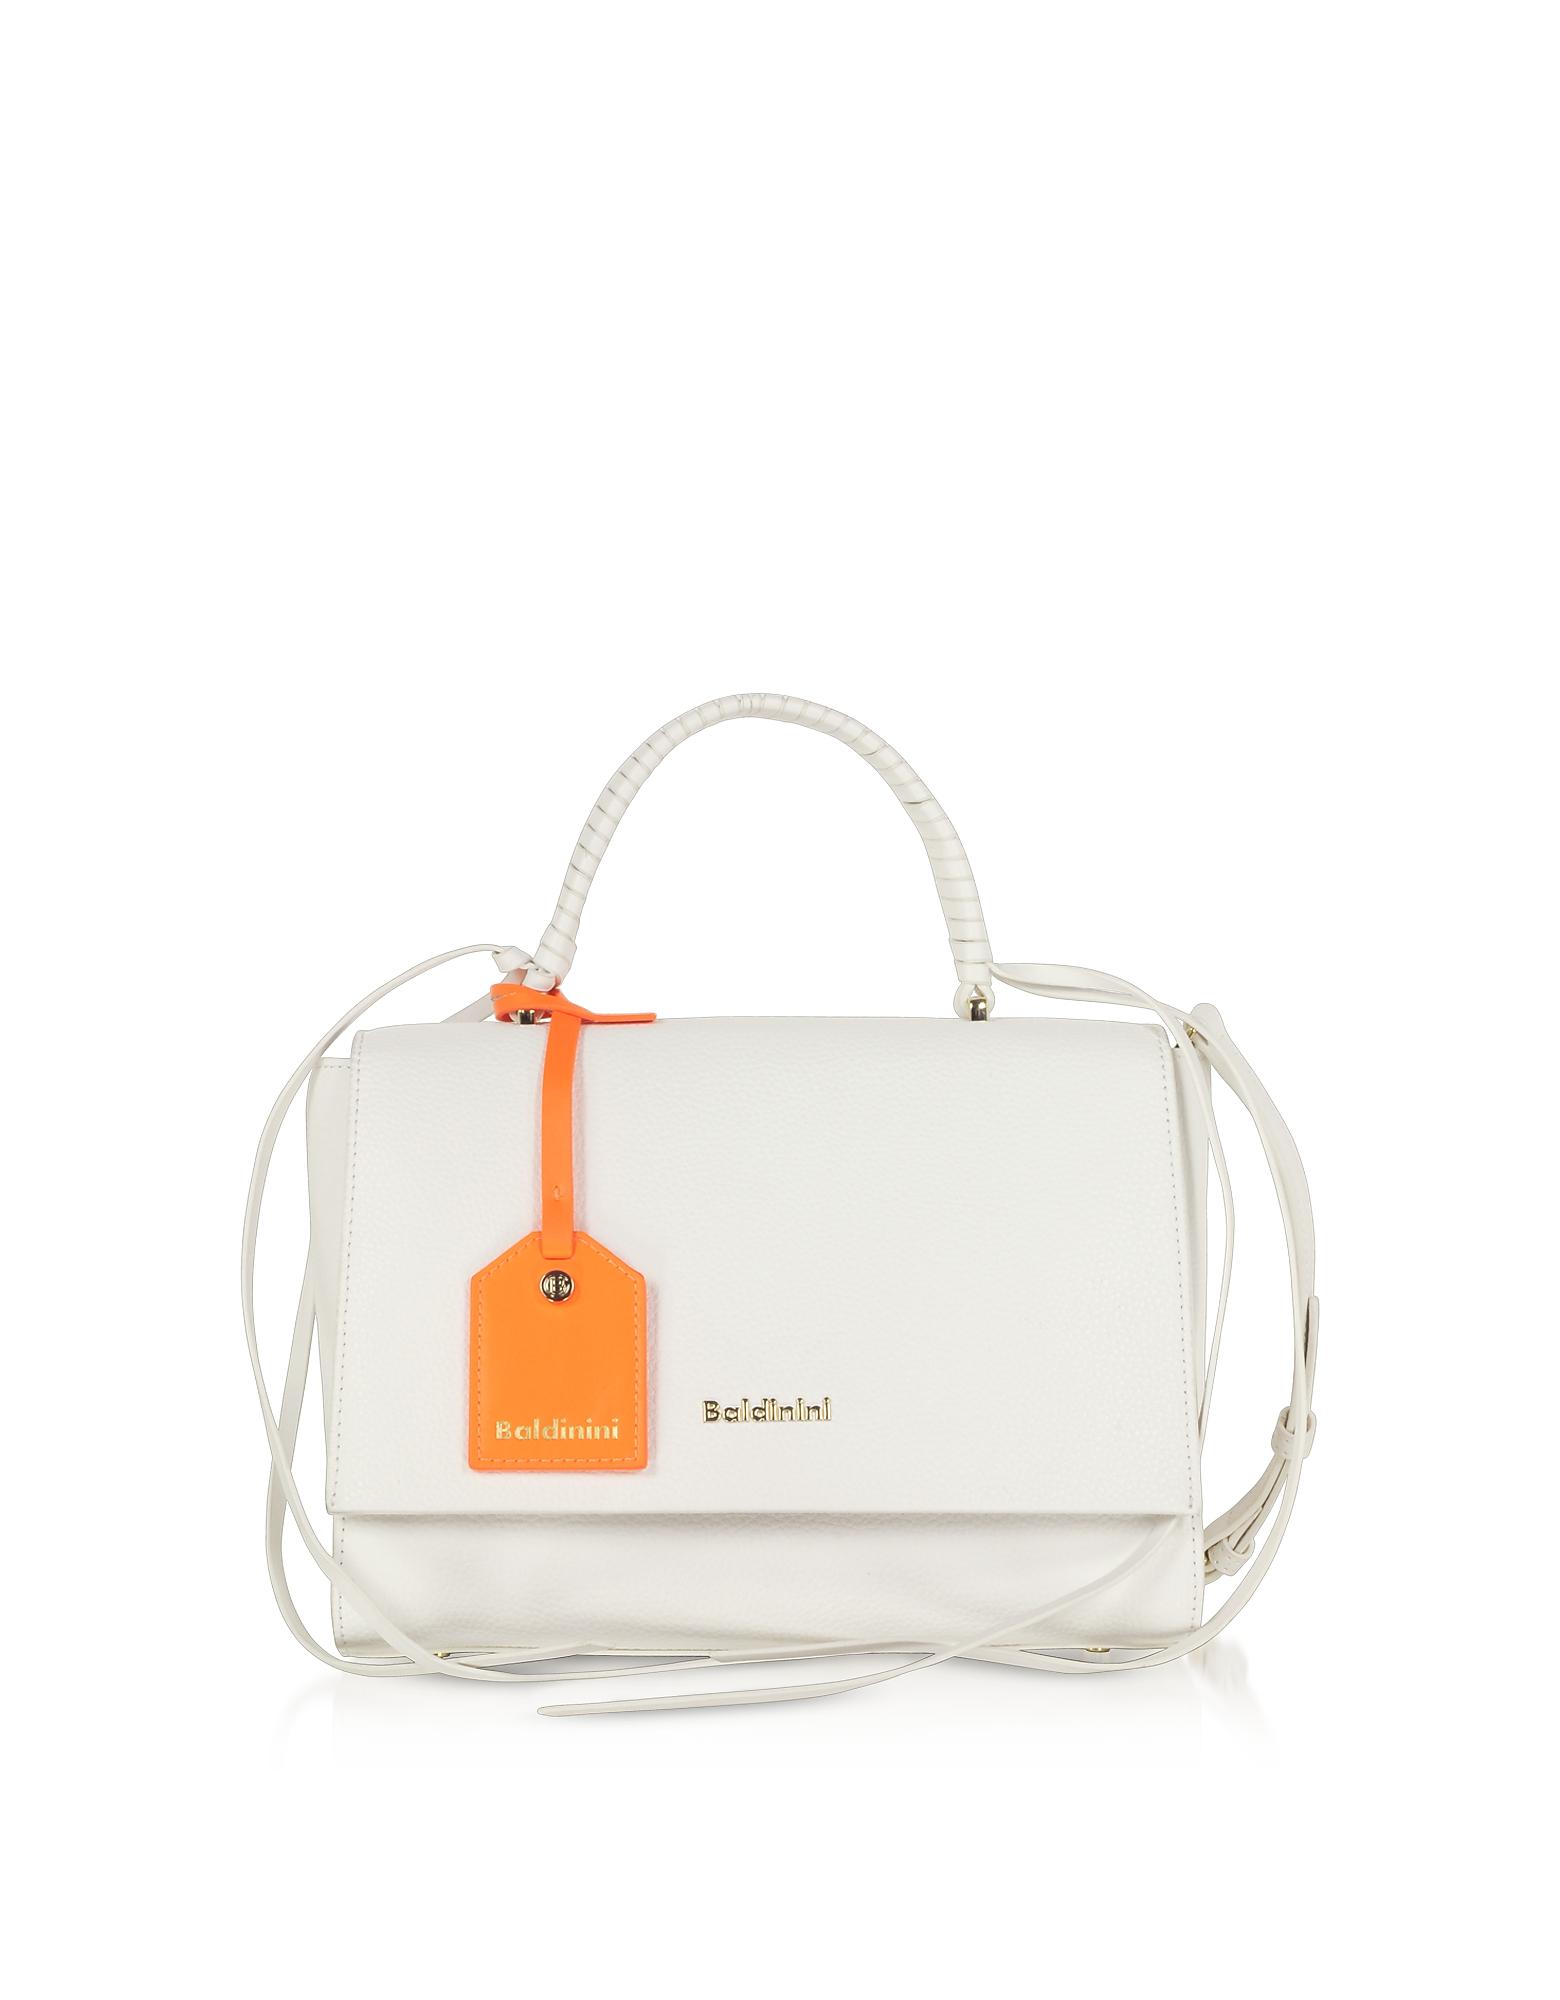 Baldinini Designer Handbags, Daisy White Satchel Bag